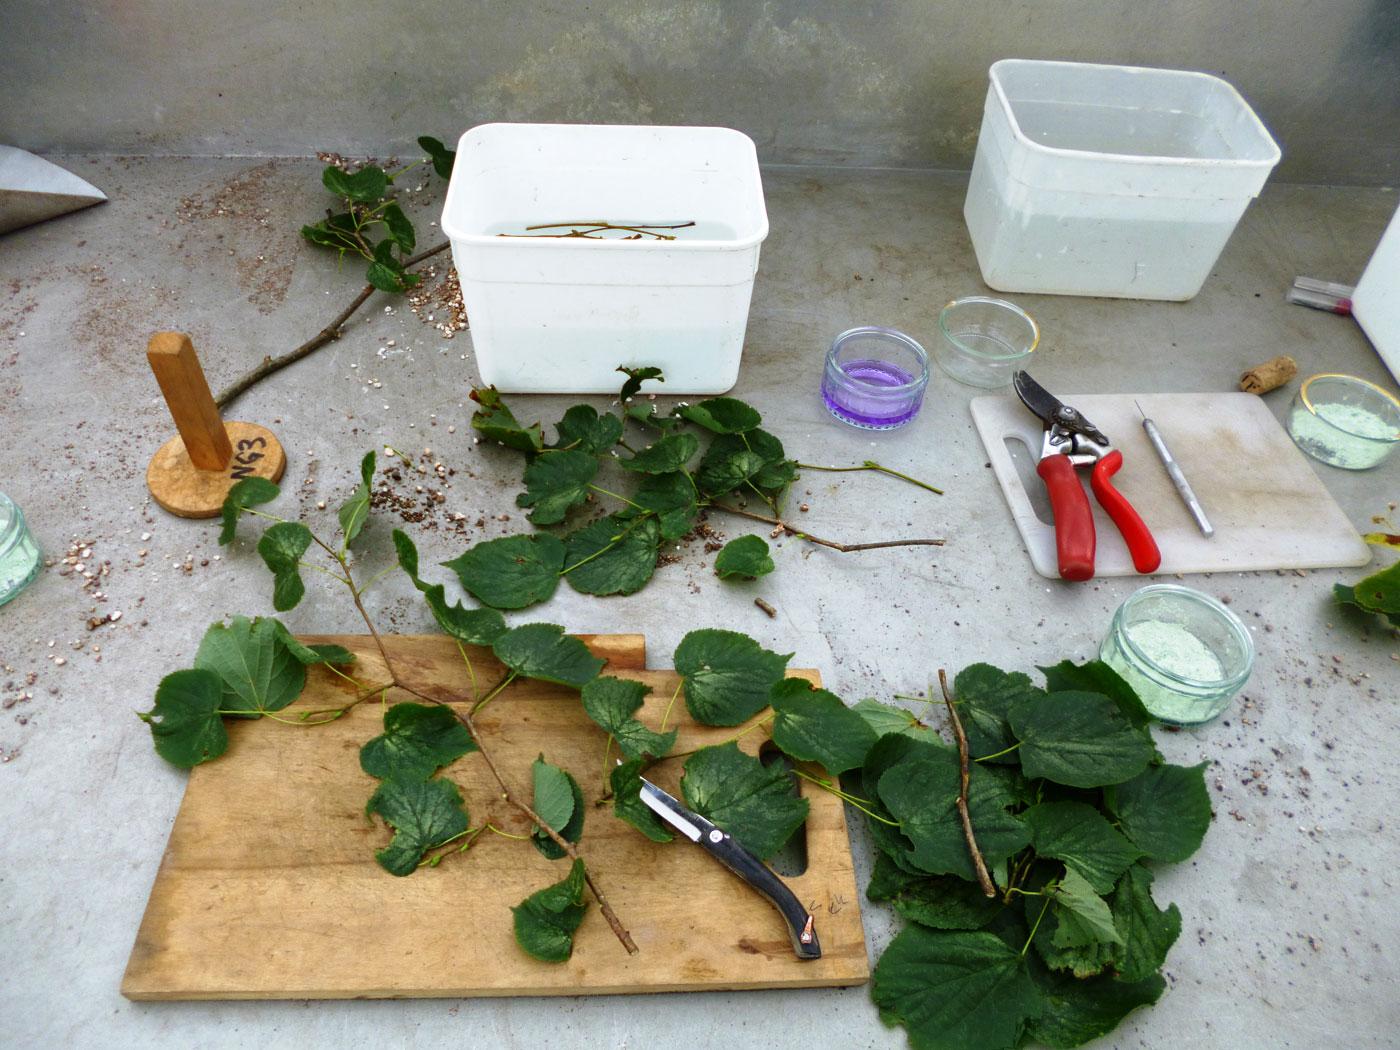 Taking cuttings of <i>Alnus glutinosa</i> at the National Botanic Gardens of Wales